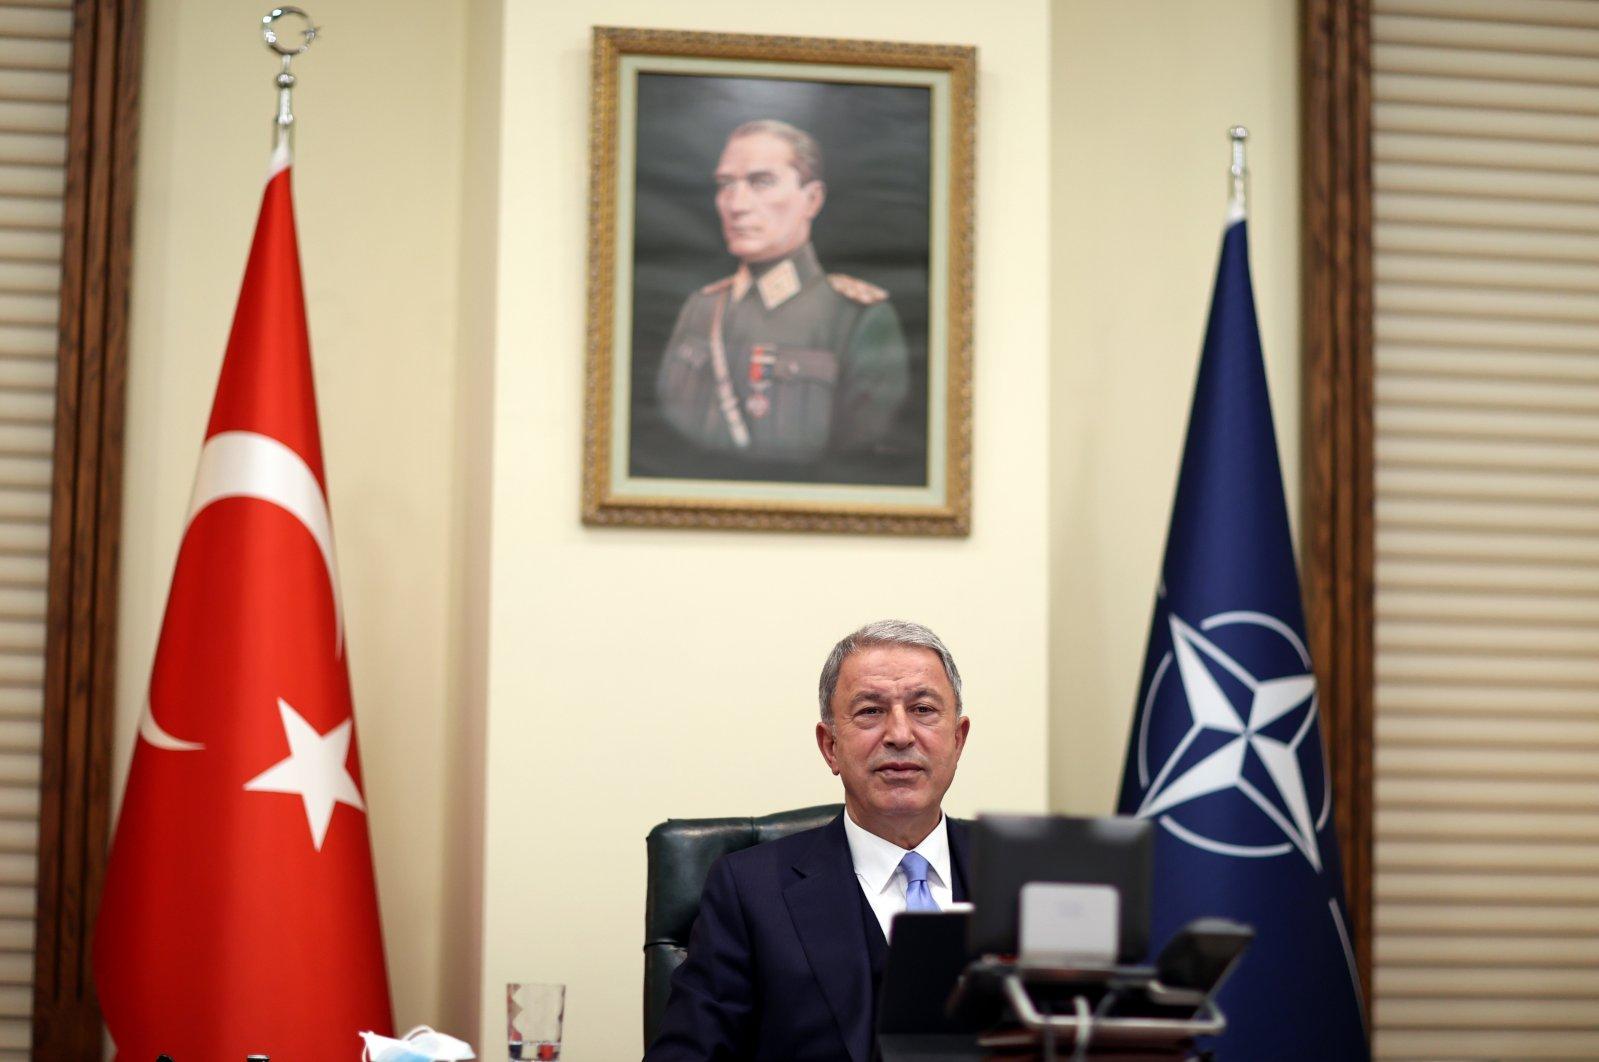 Defense Minister Hulusi Akar attends a virtual NATO meeting, June 1, 2021. (AA Photo)